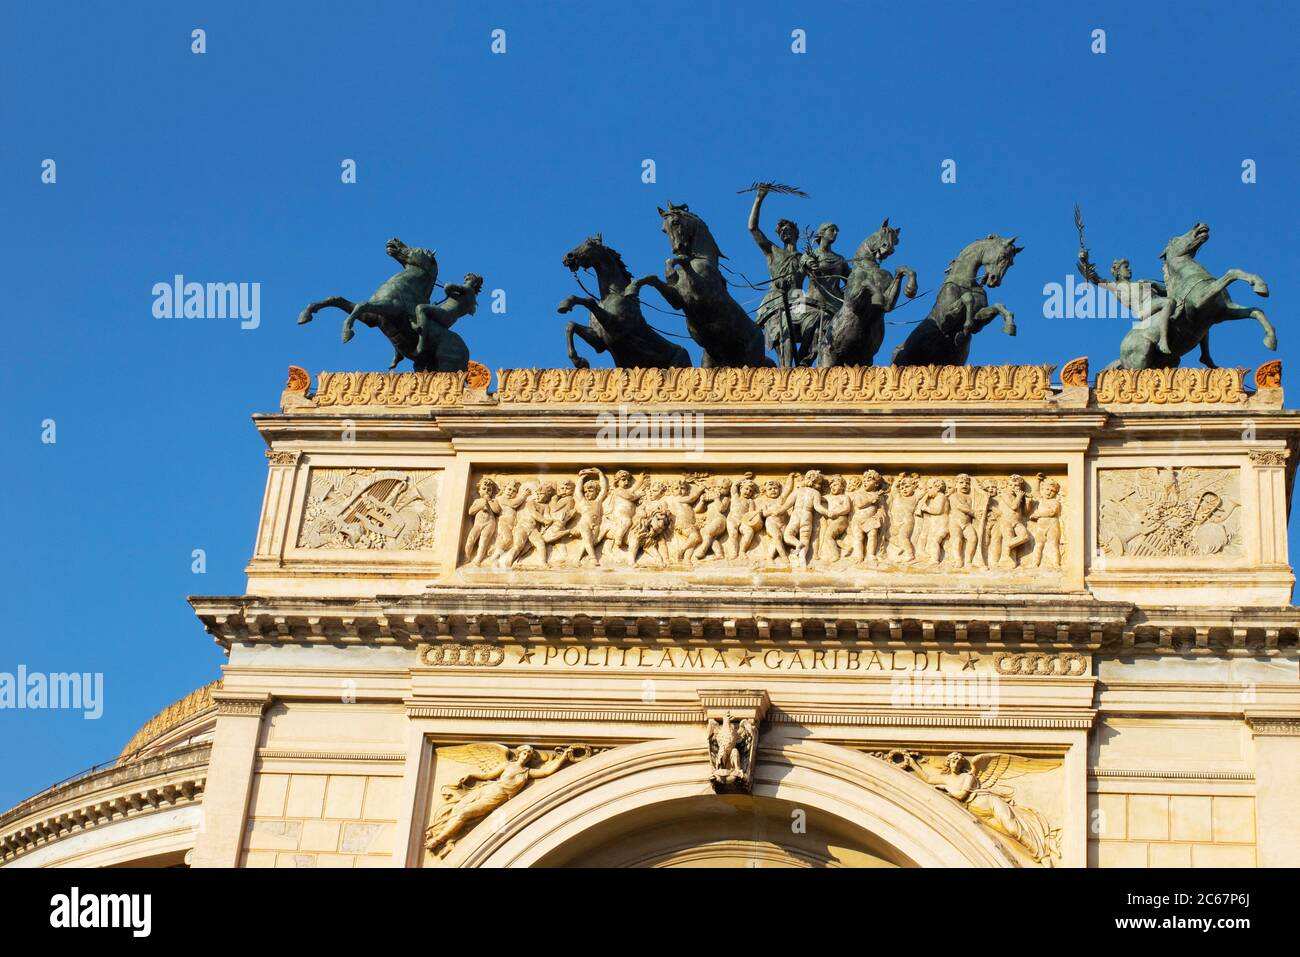 Teatro Politeama Garibaldi, Palermo, Sicily, Italy Stock Photo